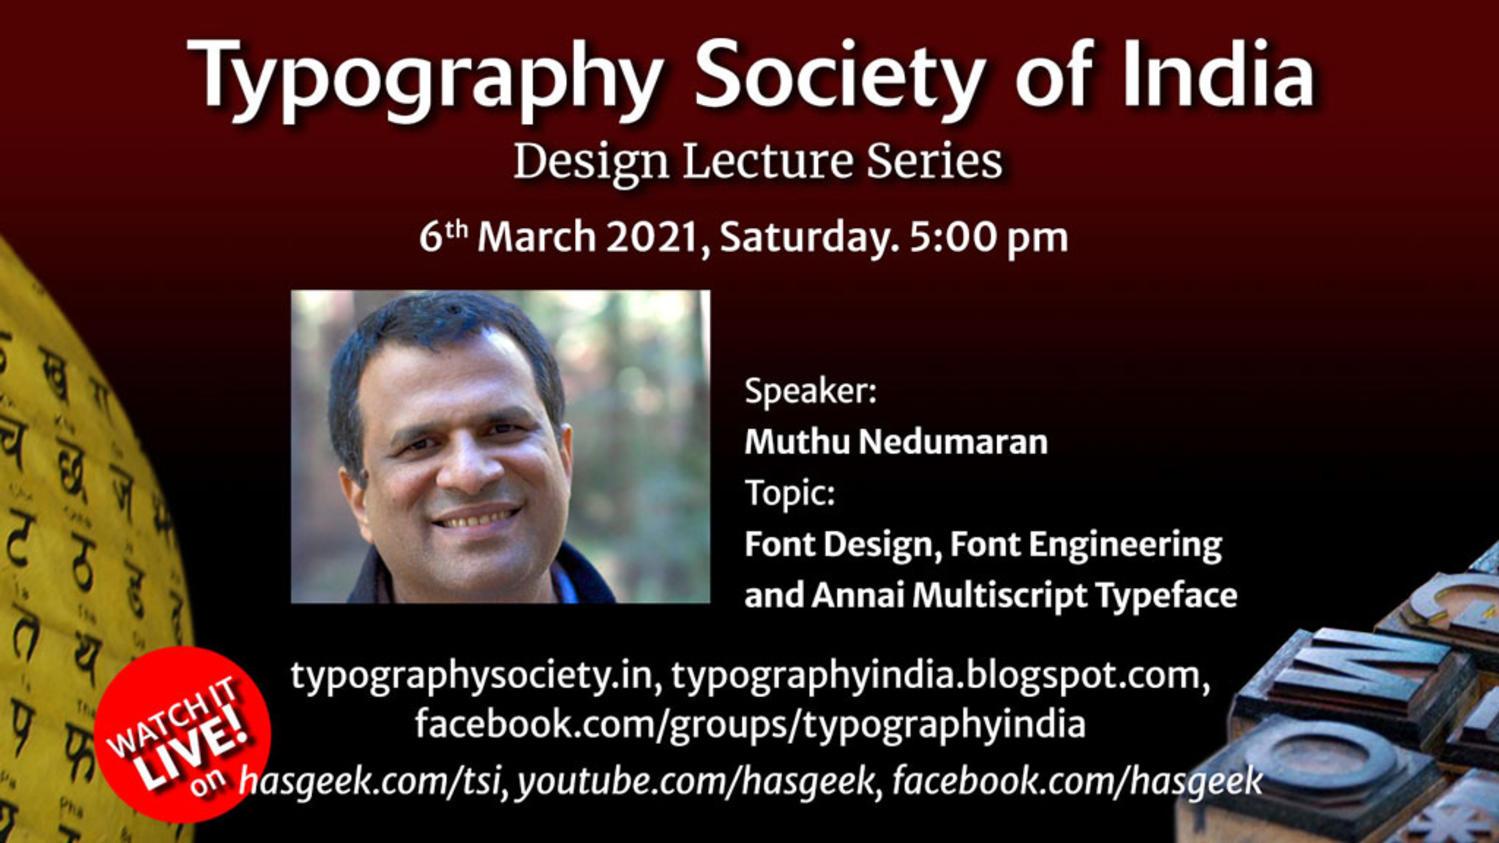 Font Design, Font engineering and Annai-Multiscript Typeface